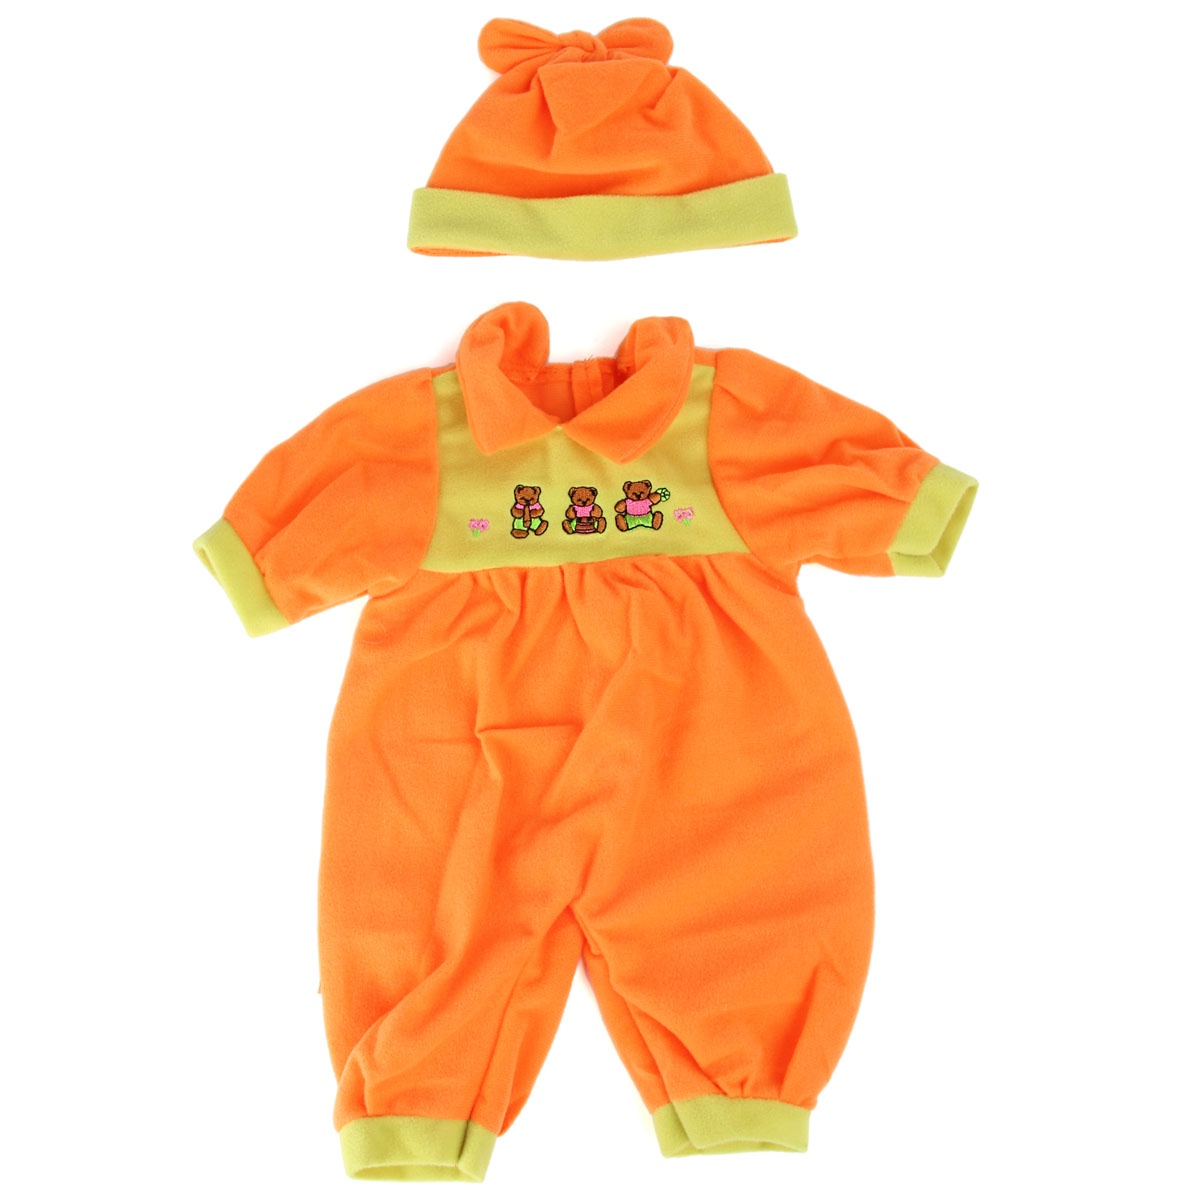 куклы и одежда для кукол asi одежда для кукол 60 см 0000092 Одежда для кукол Veld Co 75899